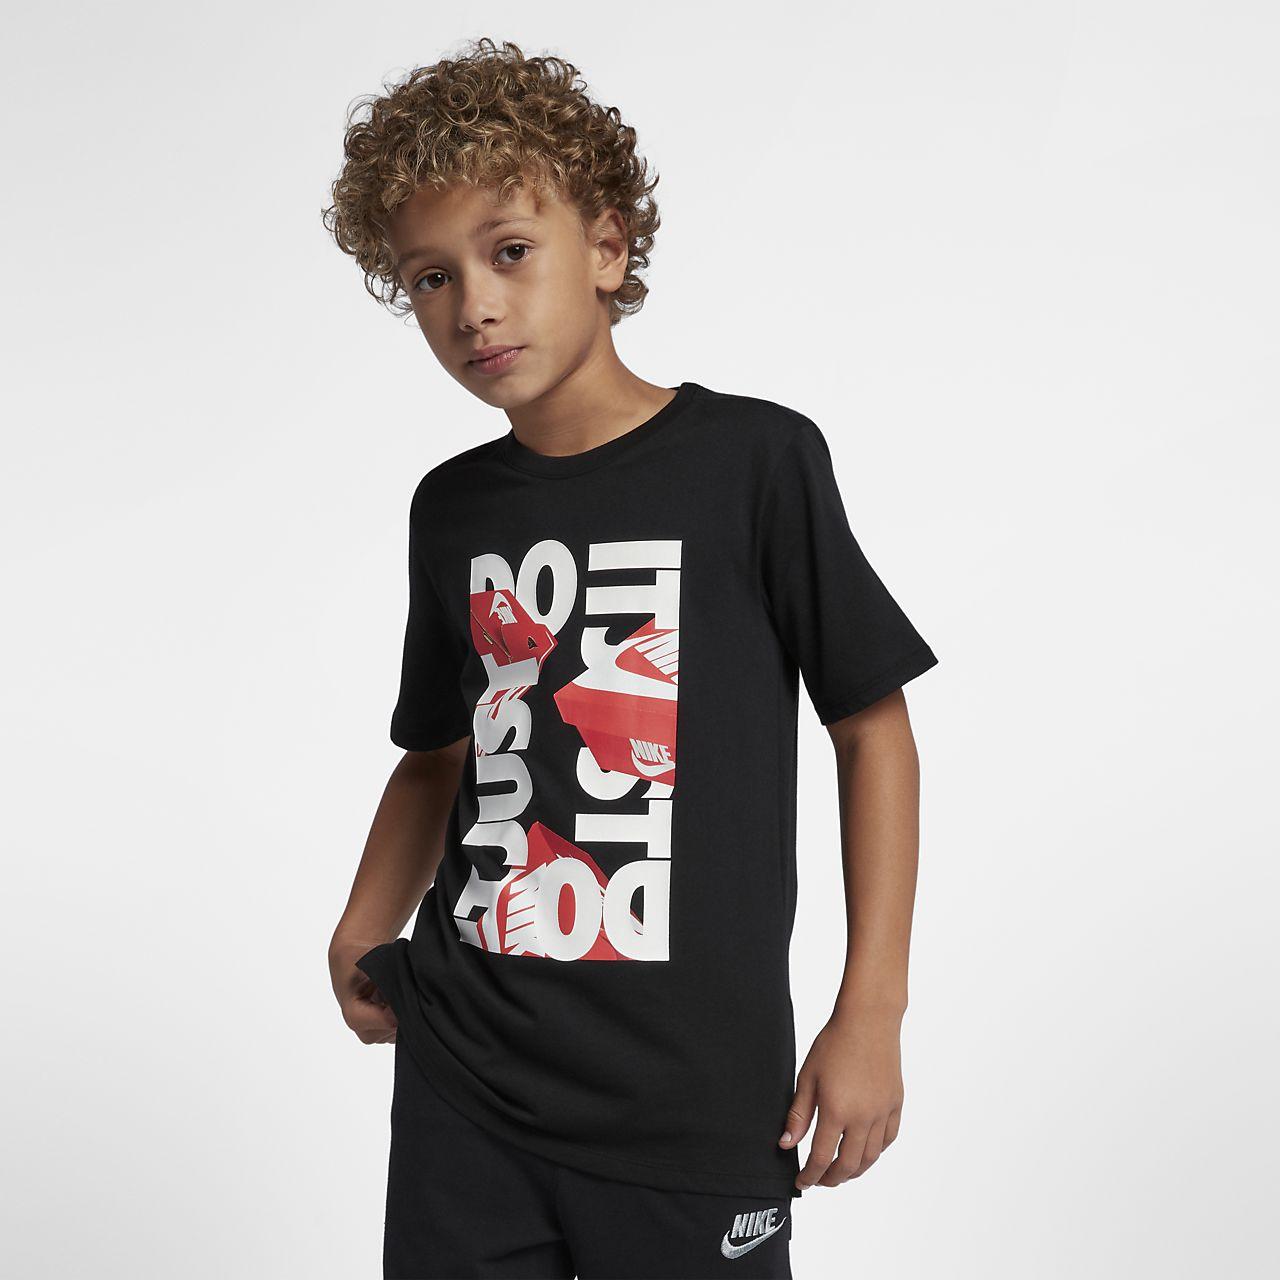 the latest 82d3e b218c Nike Sportswear Older Kids (Boys) Just Do It T-Shirt. Nike.c